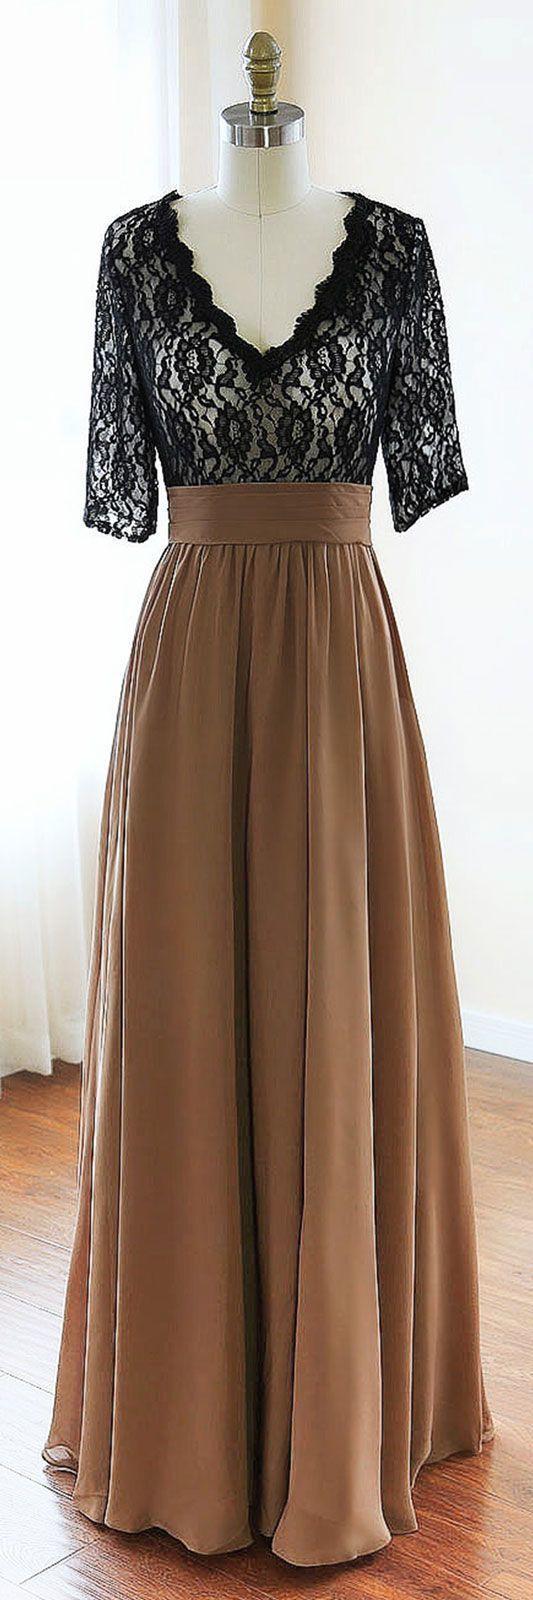 black v neck chiffon lace long prom dress, black evening dress, lace bridesmaid